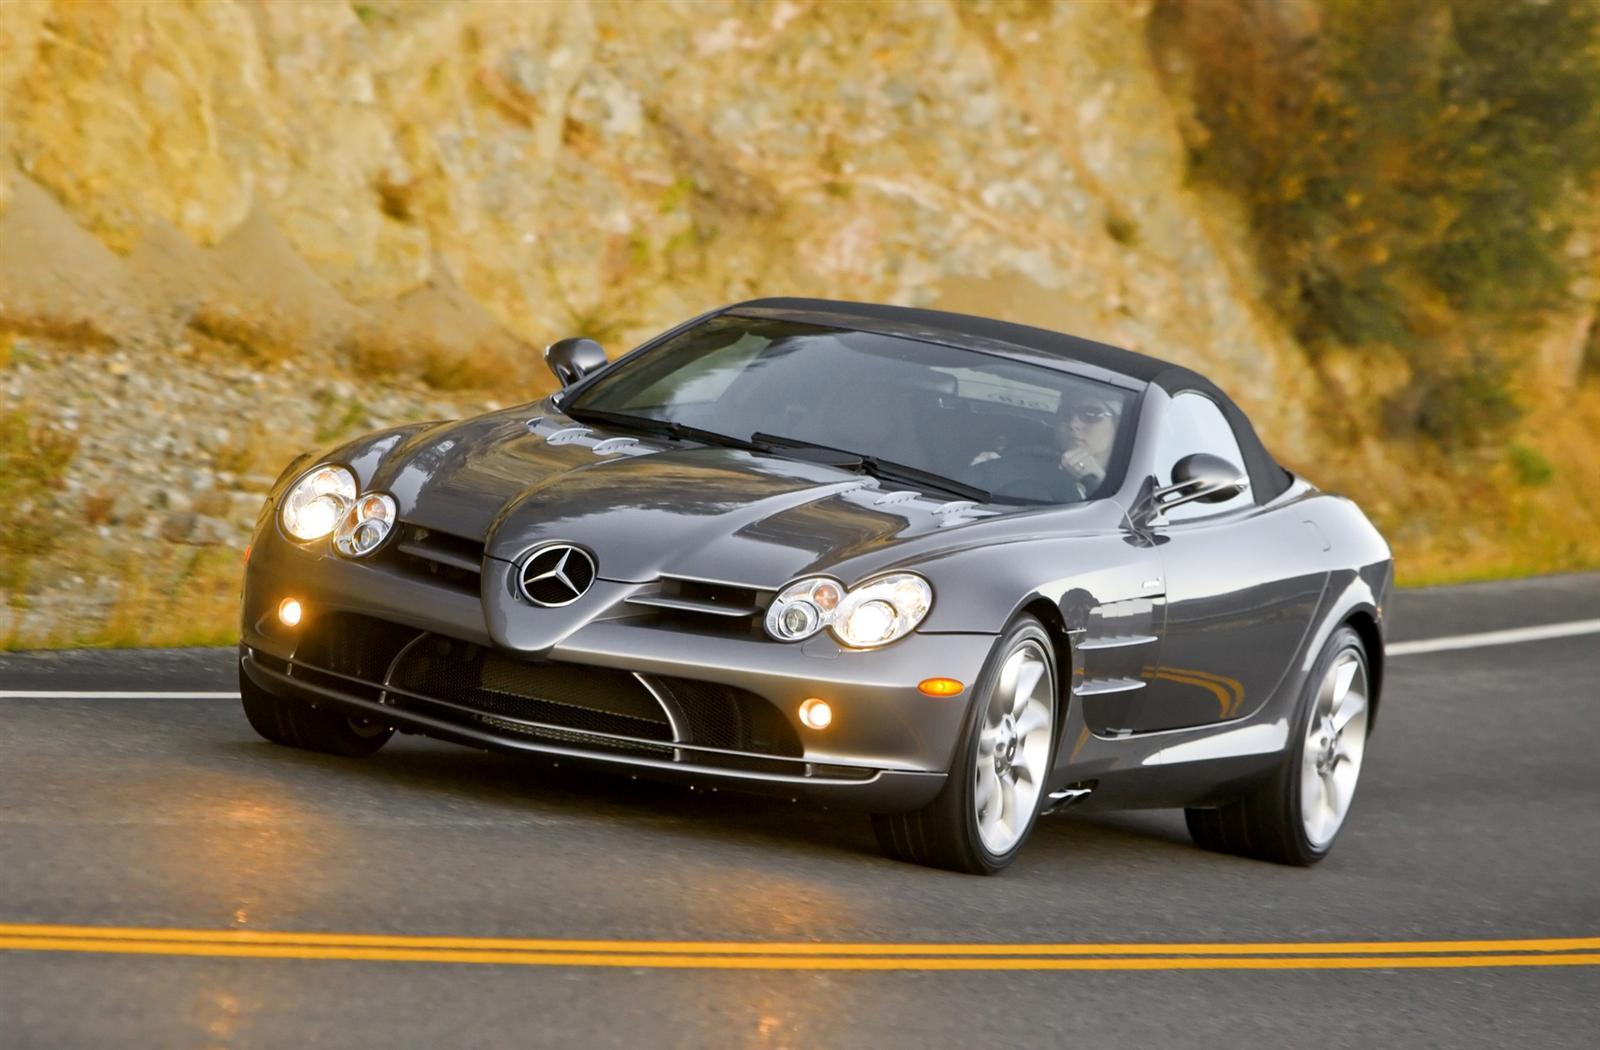 1600x1050 2008 mercedes benz slr mclaren roadster